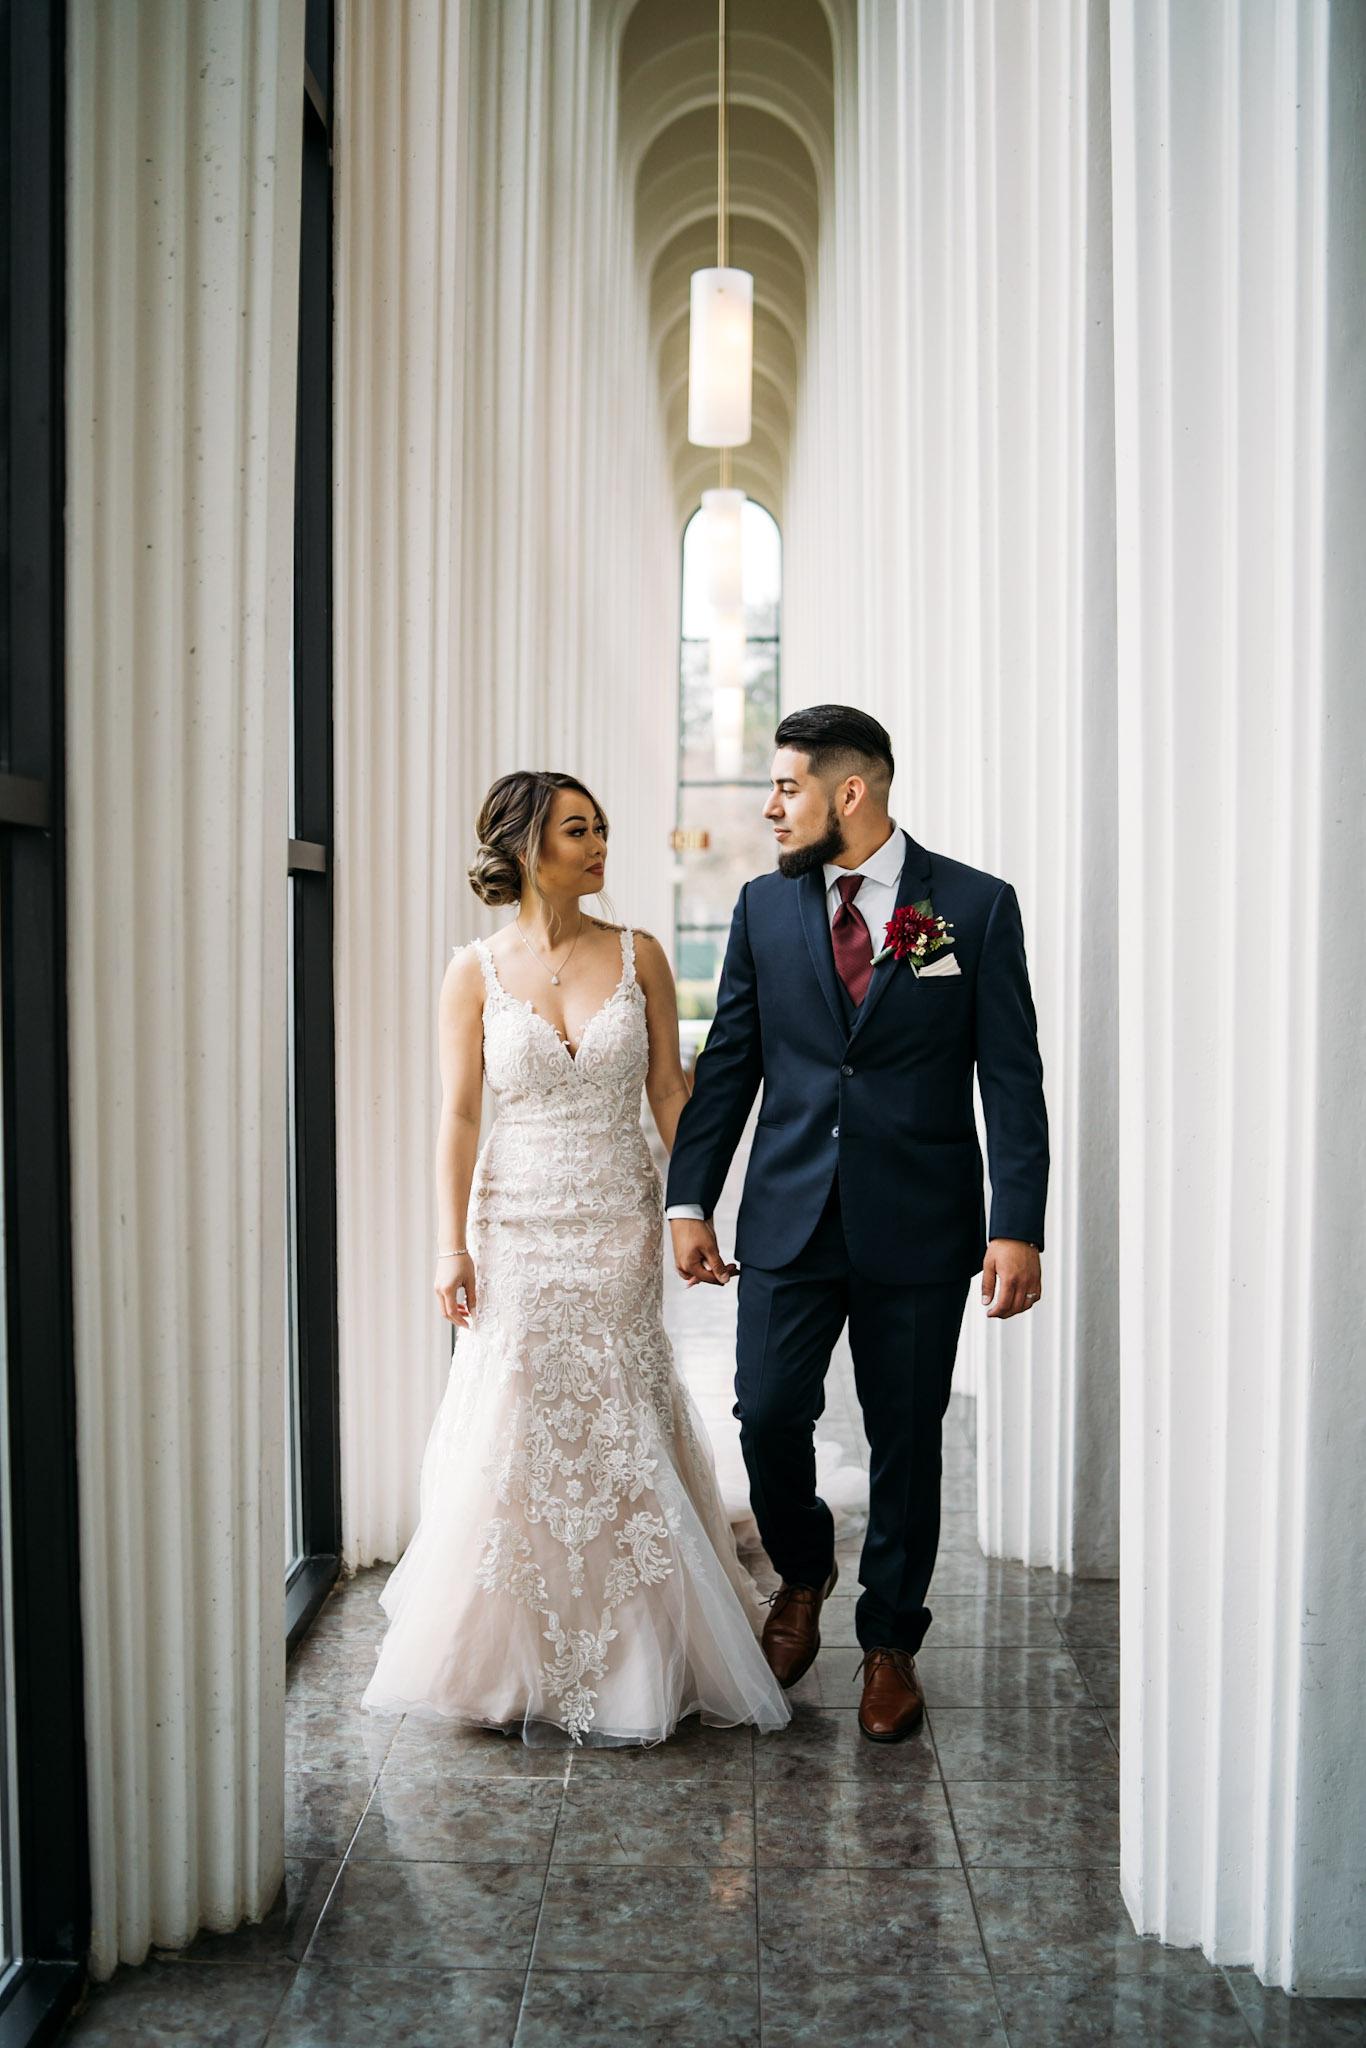 20190209-Cindy-Efren-Zapata-Wedding_CR35639.JPG